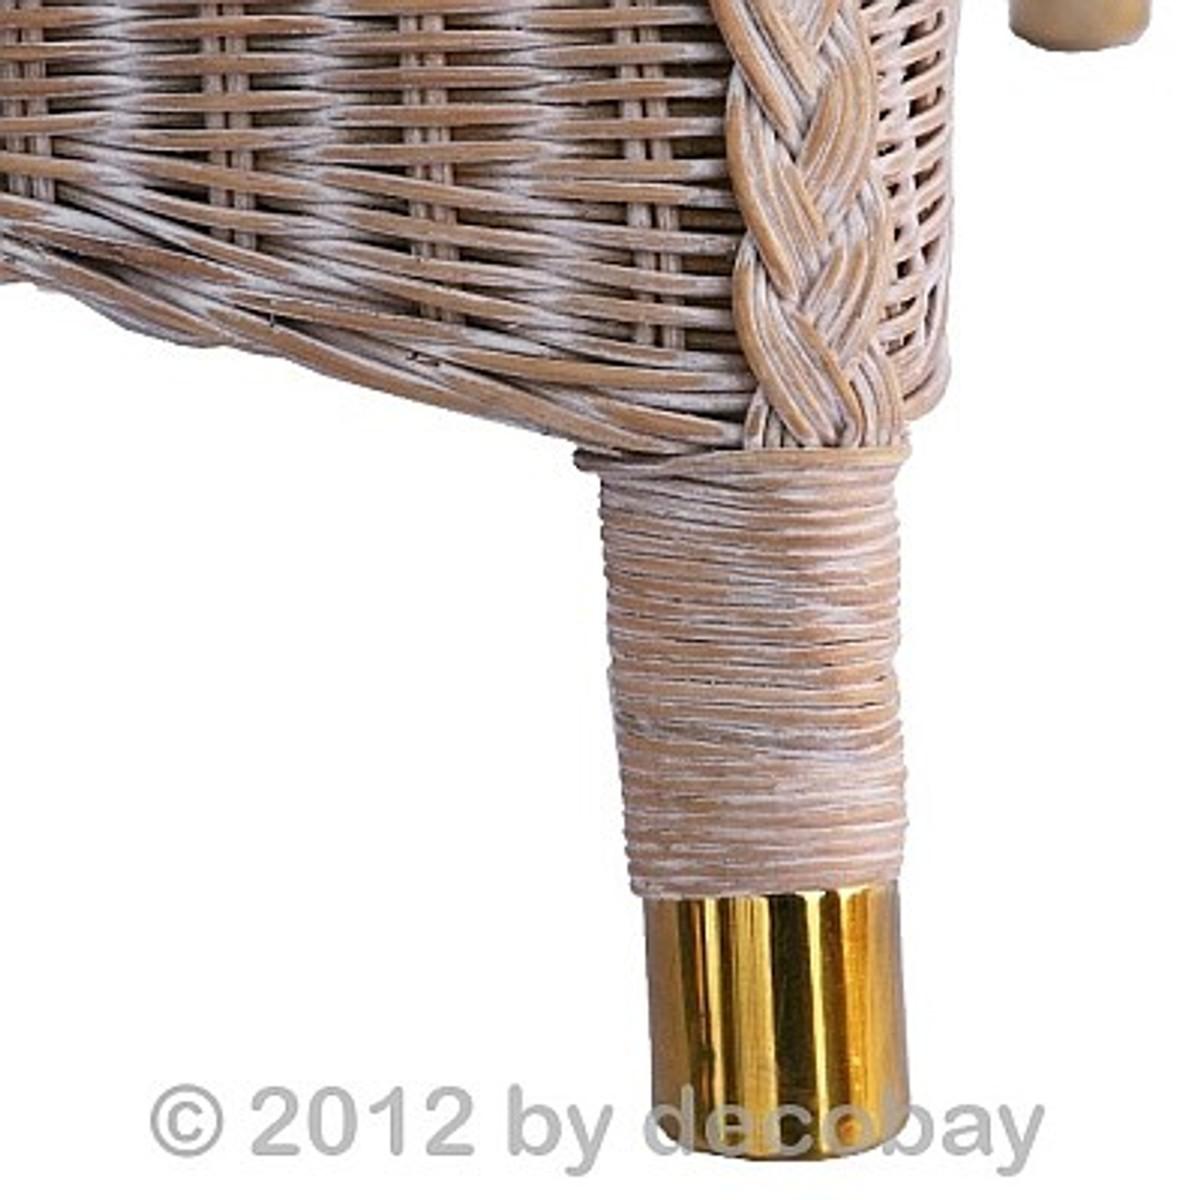 rattan stuhl aus ried schilf wei geb rstet sitzm bel haus balkon terrasse rattan m bel rattan. Black Bedroom Furniture Sets. Home Design Ideas